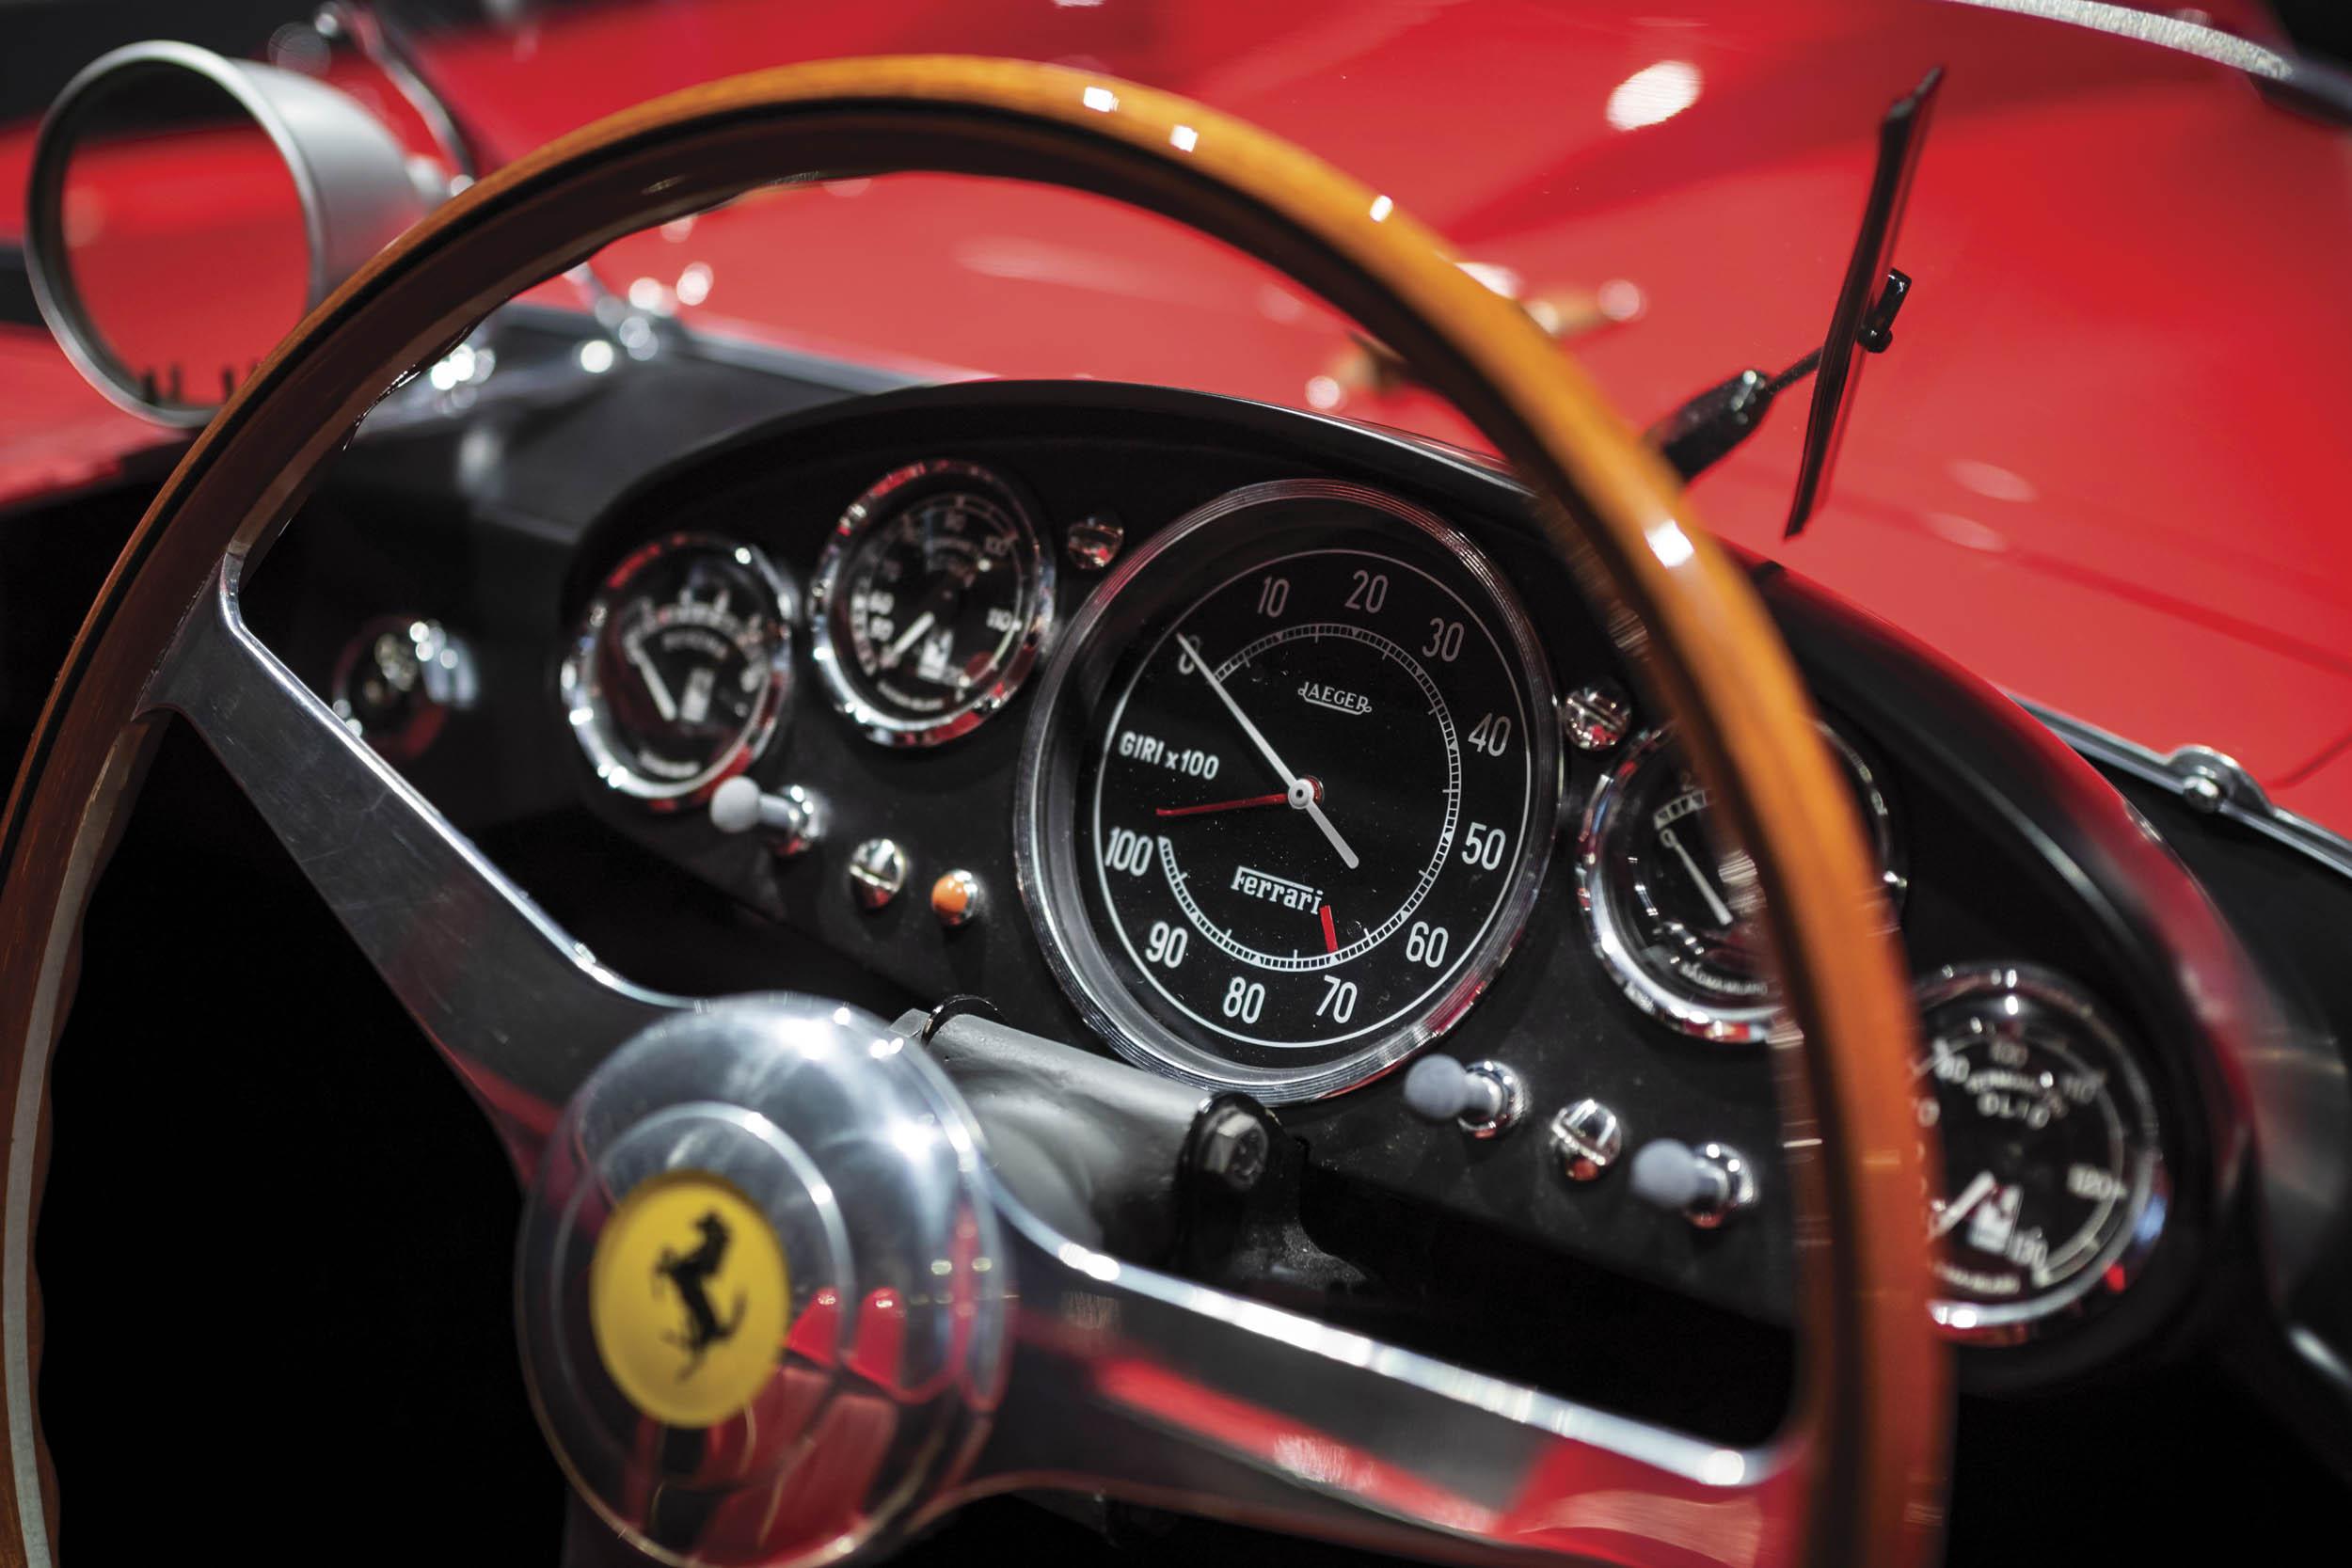 1956 Ferrari 290 MM steering wheel